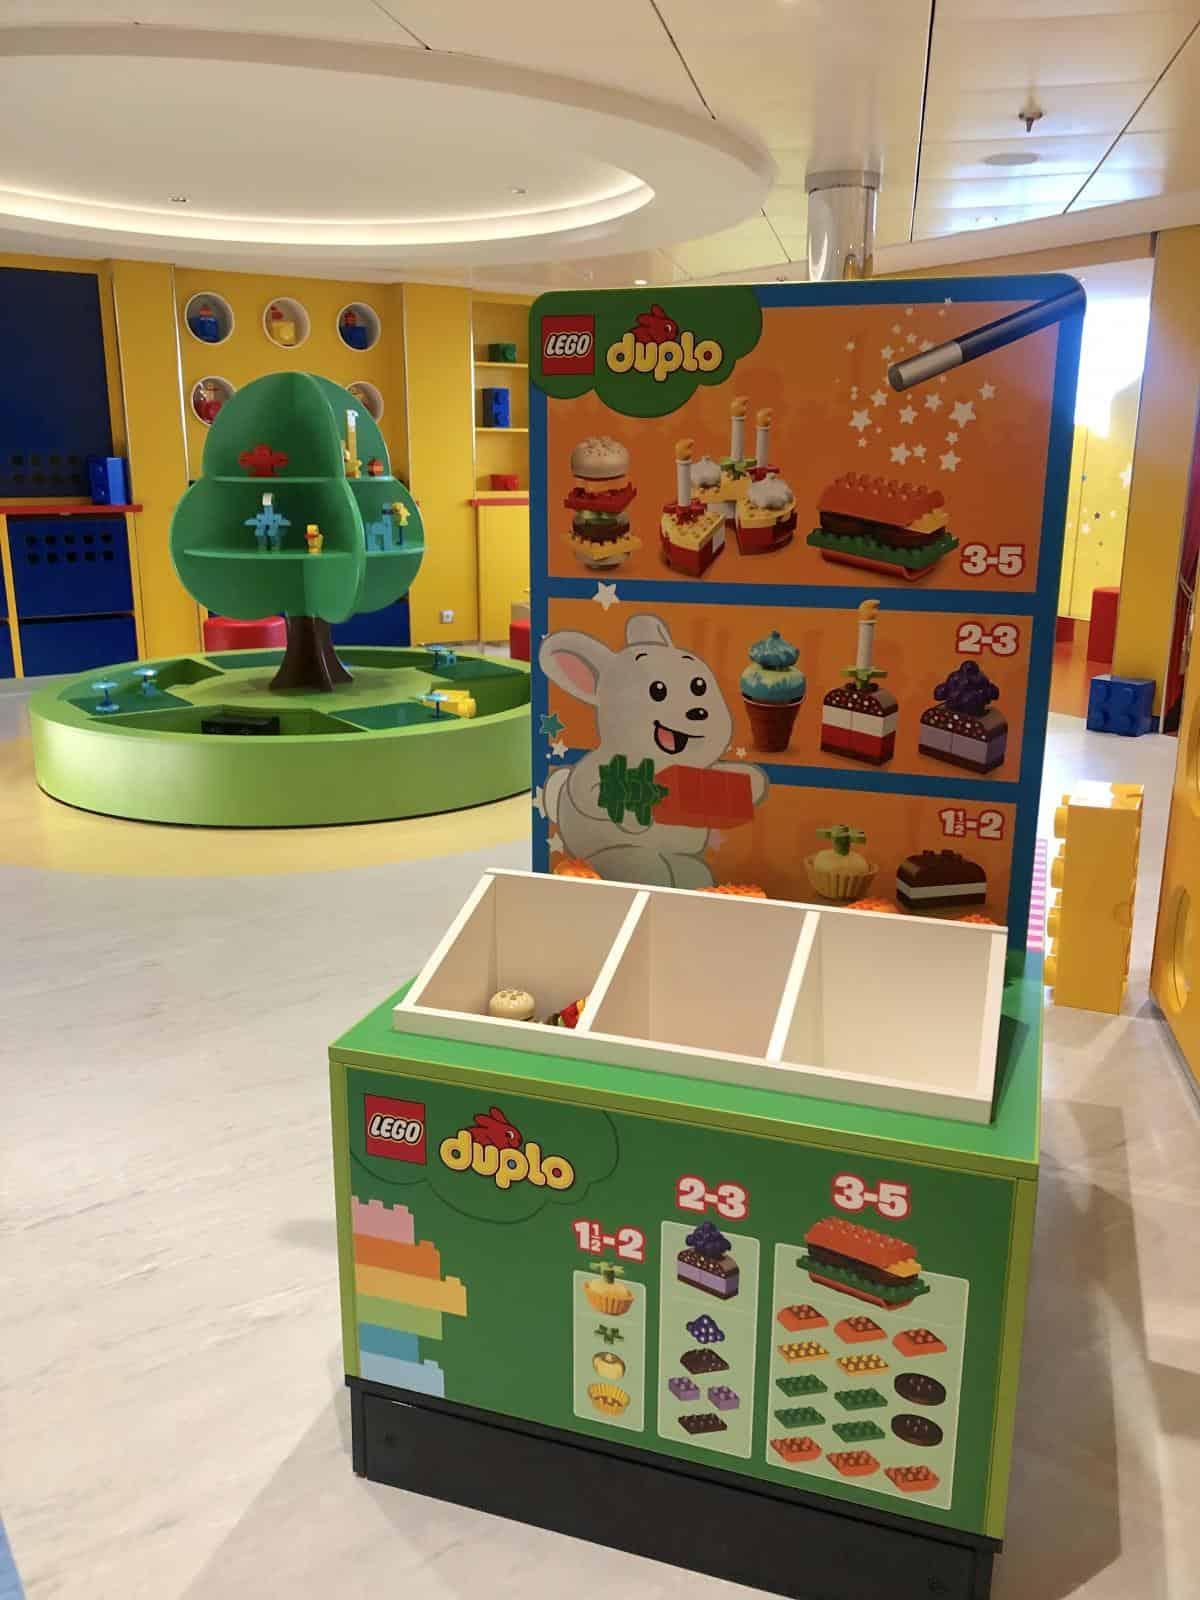 MSC Bellissima Kids club Mini Duplo lego Room